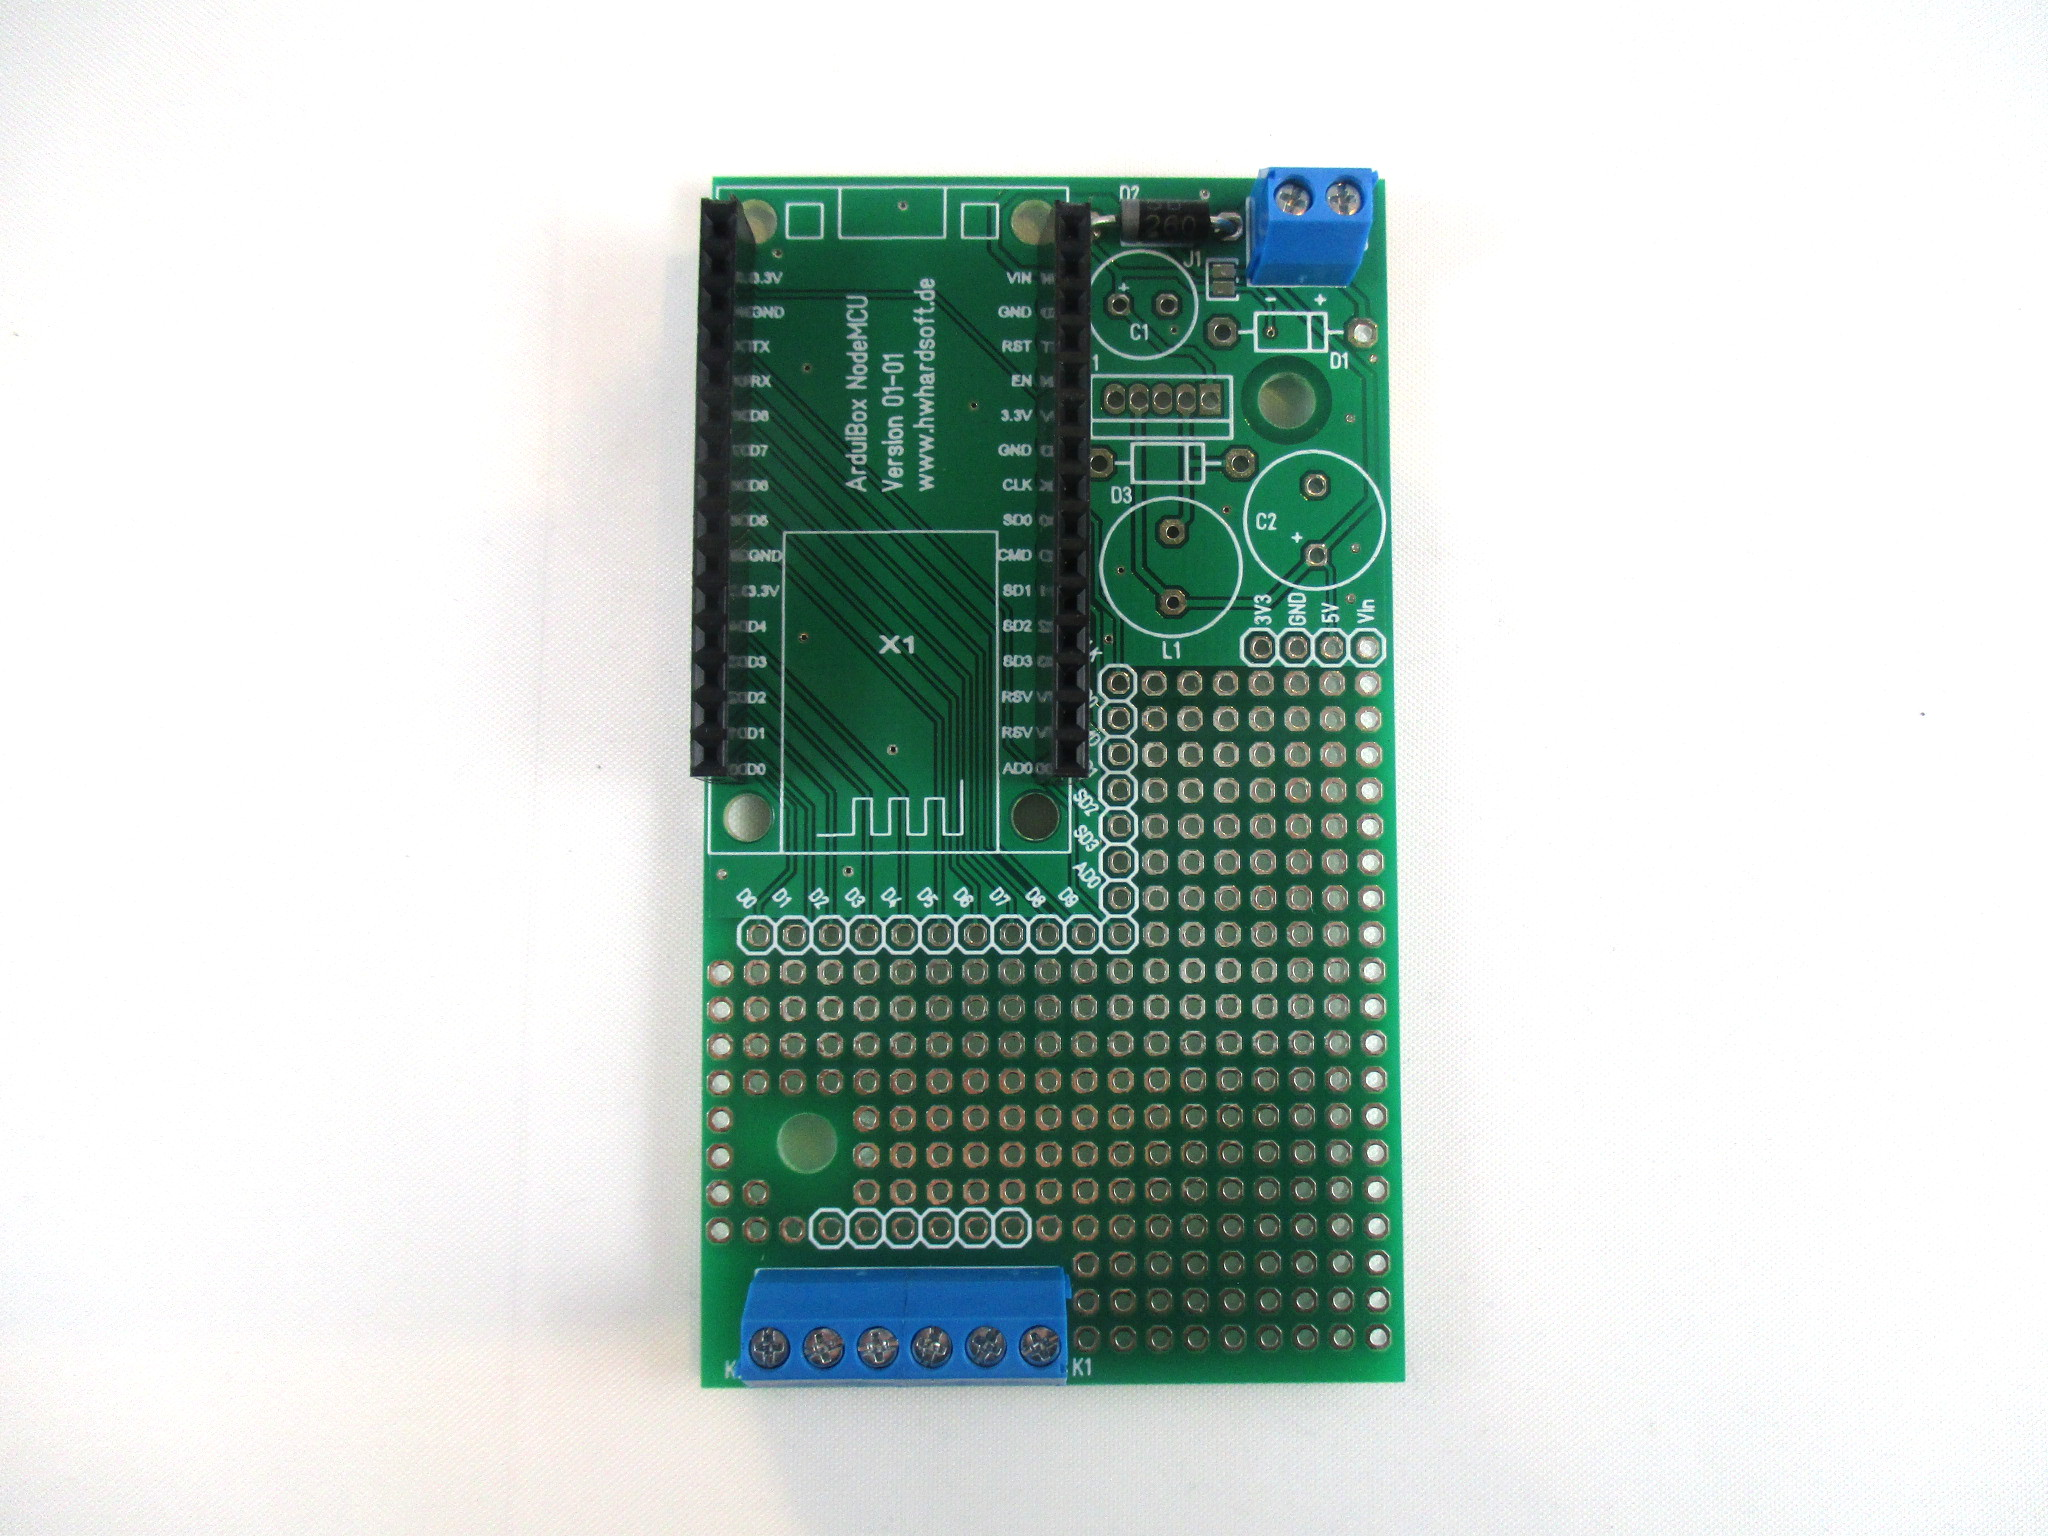 Picture of Remove the NodeMCU Module